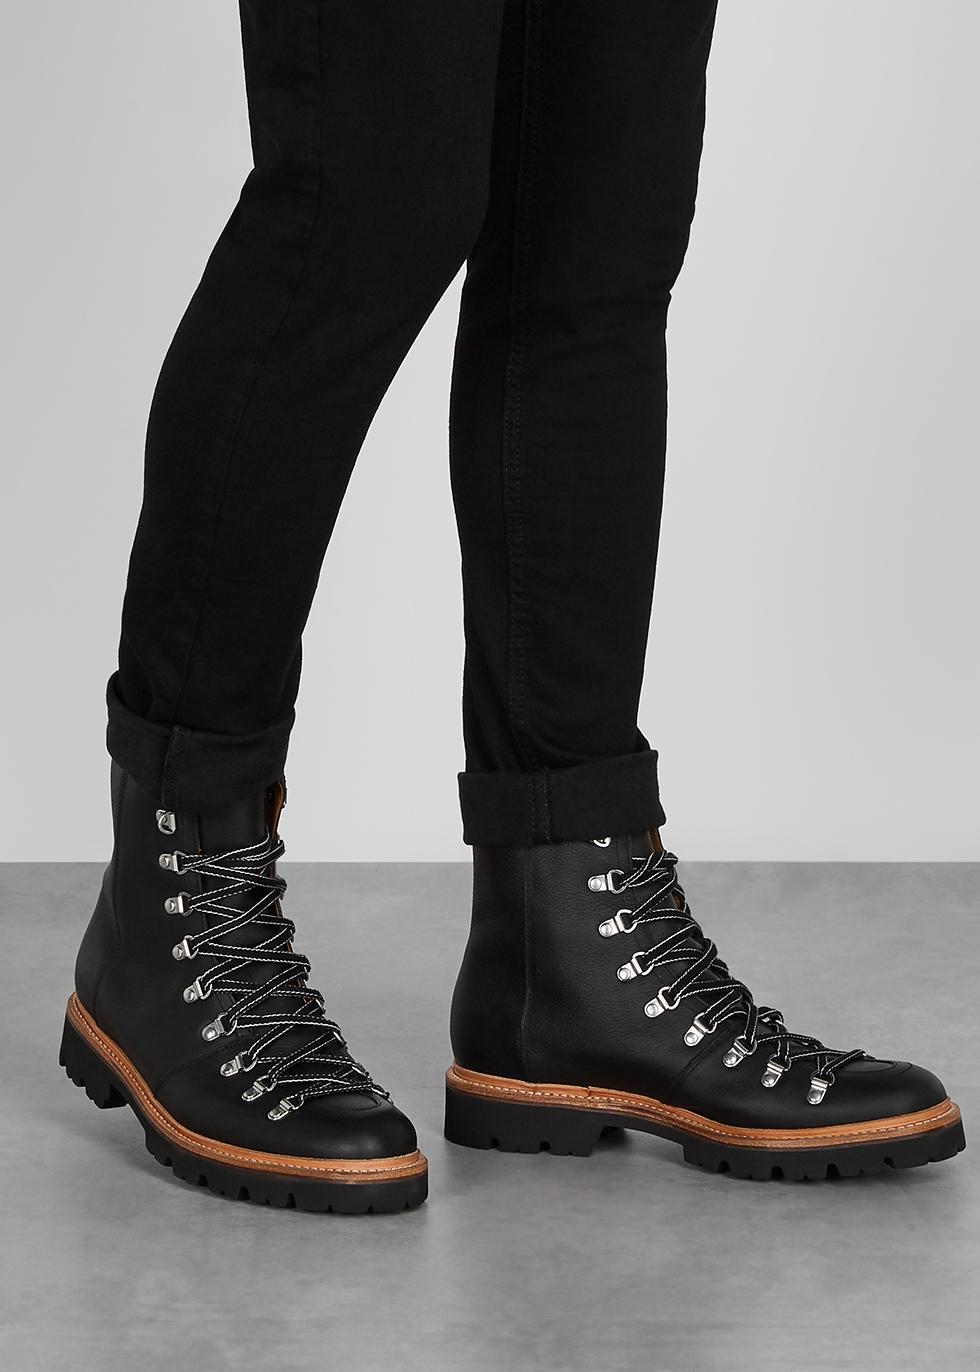 grenson hiking boots